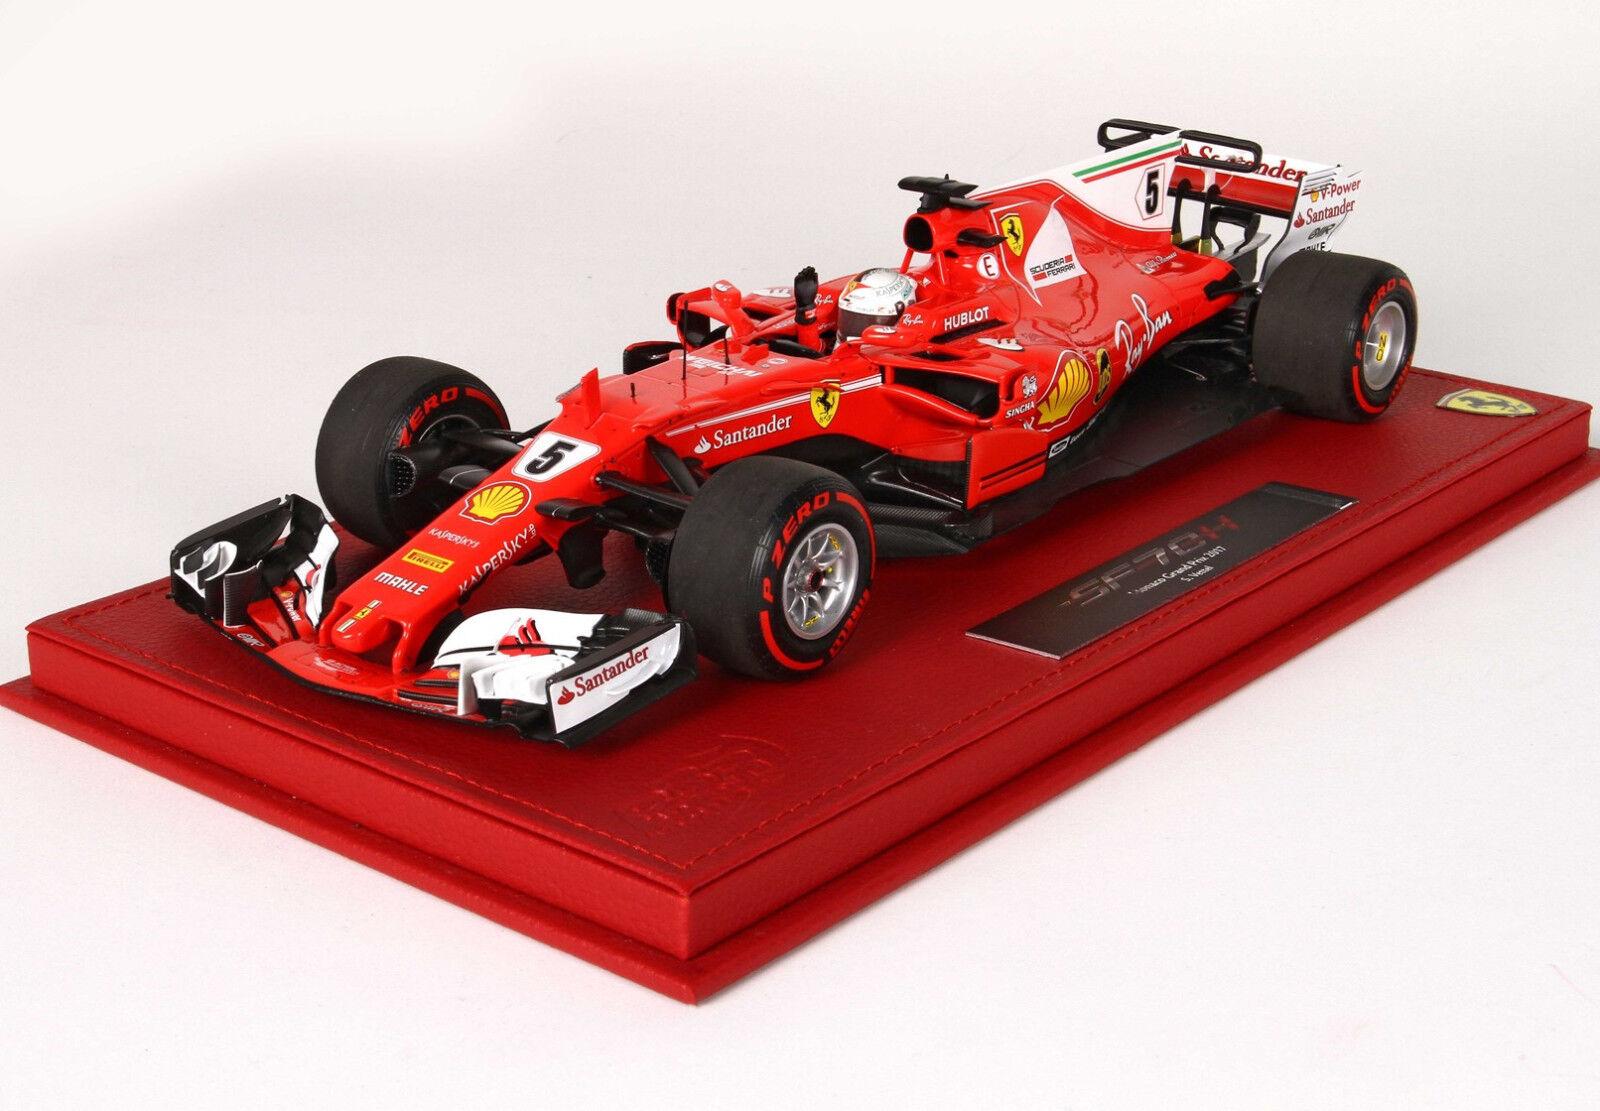 Ferrari SF70-H G.P. Montecarlo 2017 winner S. Vettel 1 18 lim.ed.100 pcs display